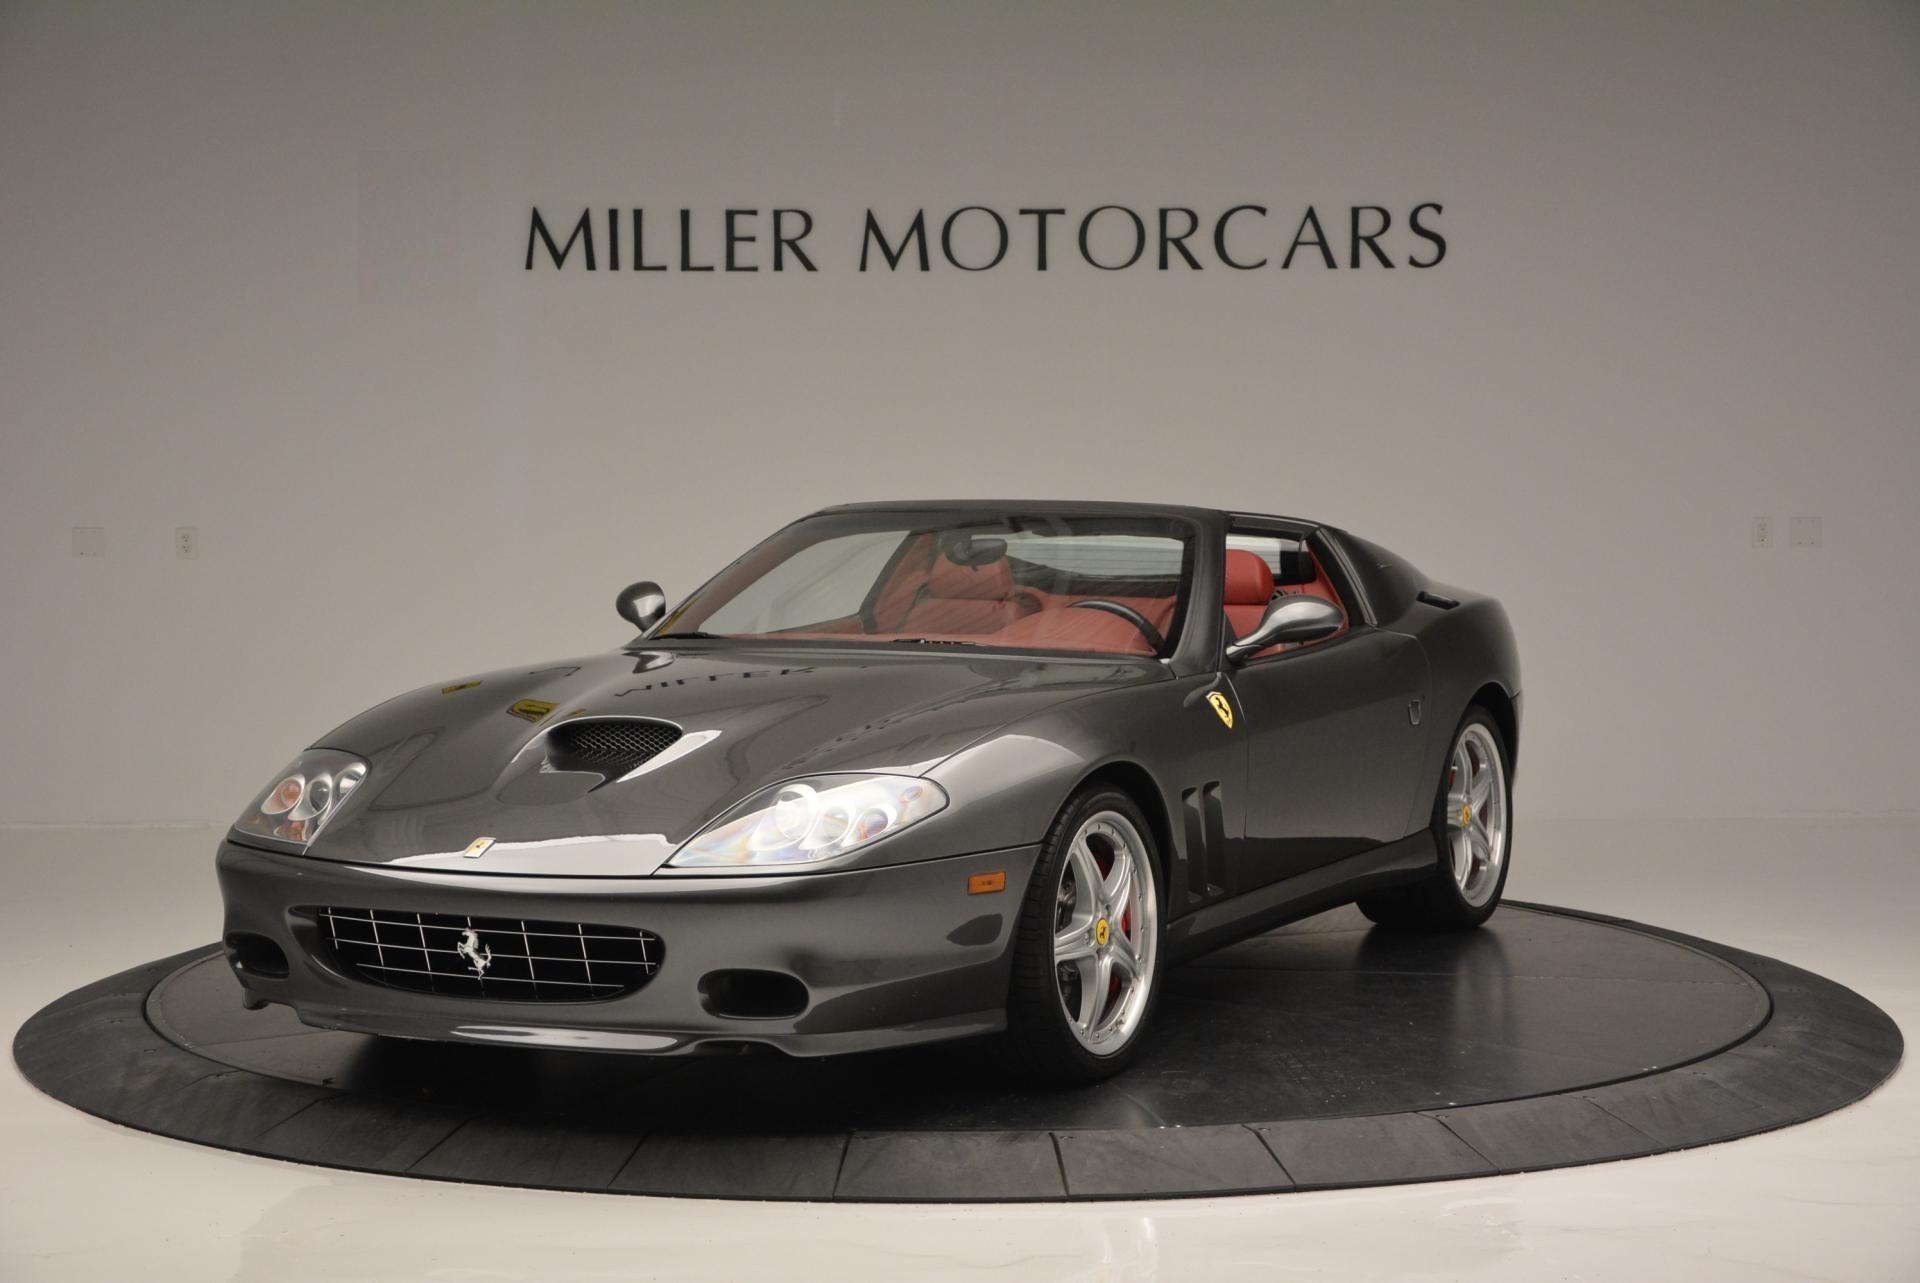 Used 2005 Ferrari Superamerica for sale $349,900 at Bentley Greenwich in Greenwich CT 06830 1